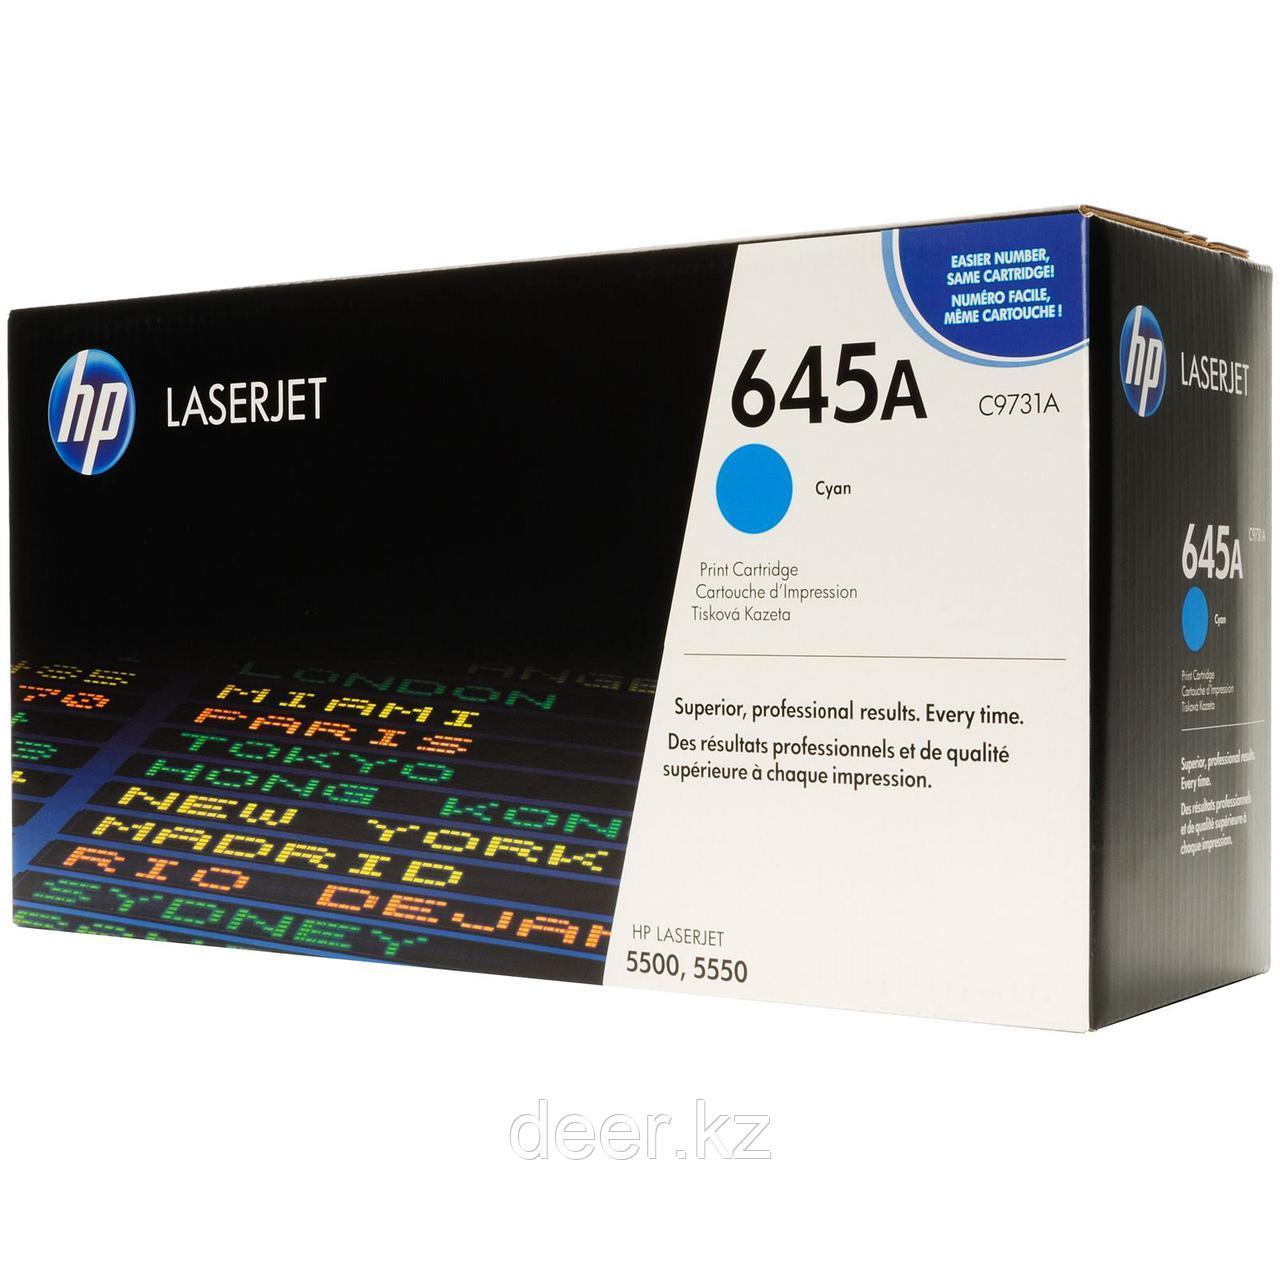 Картридж HP Laser/cyan C9731A